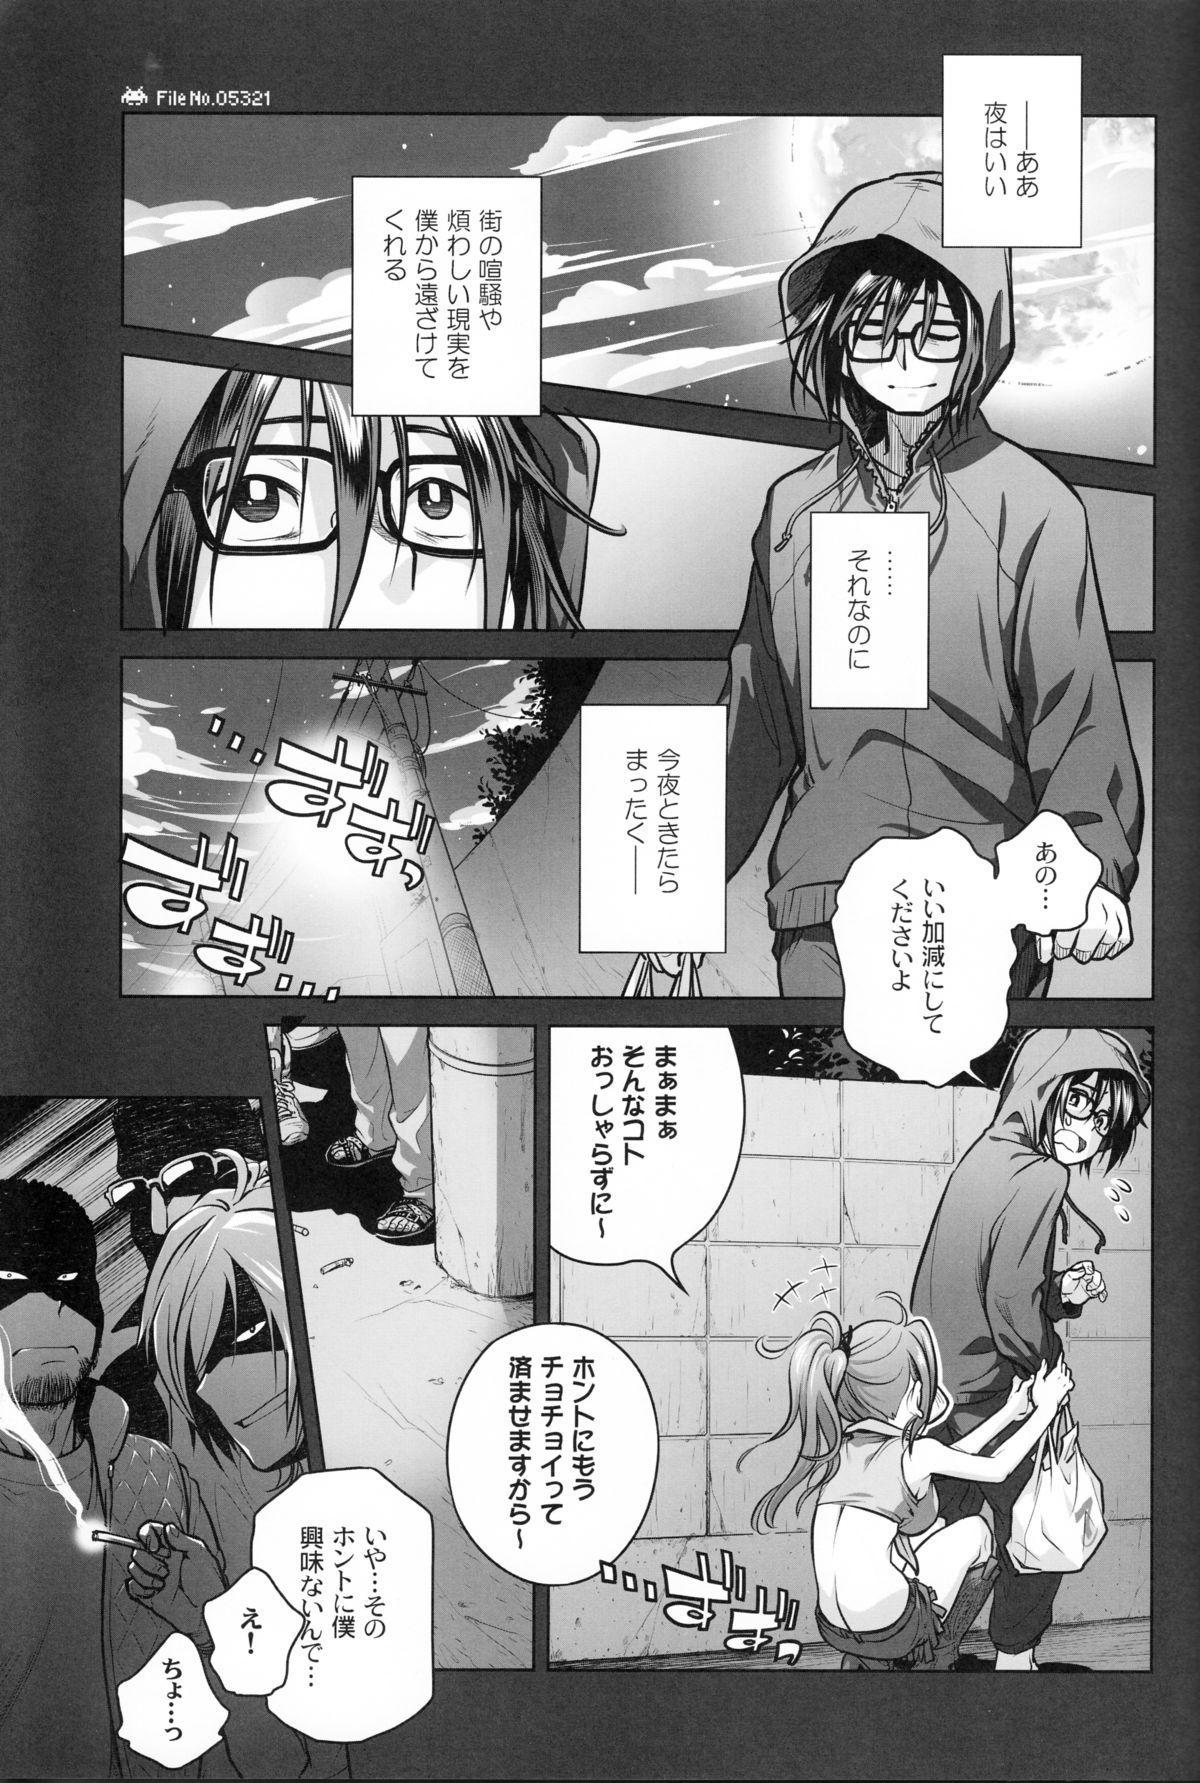 Sorako no Tabi 6 1